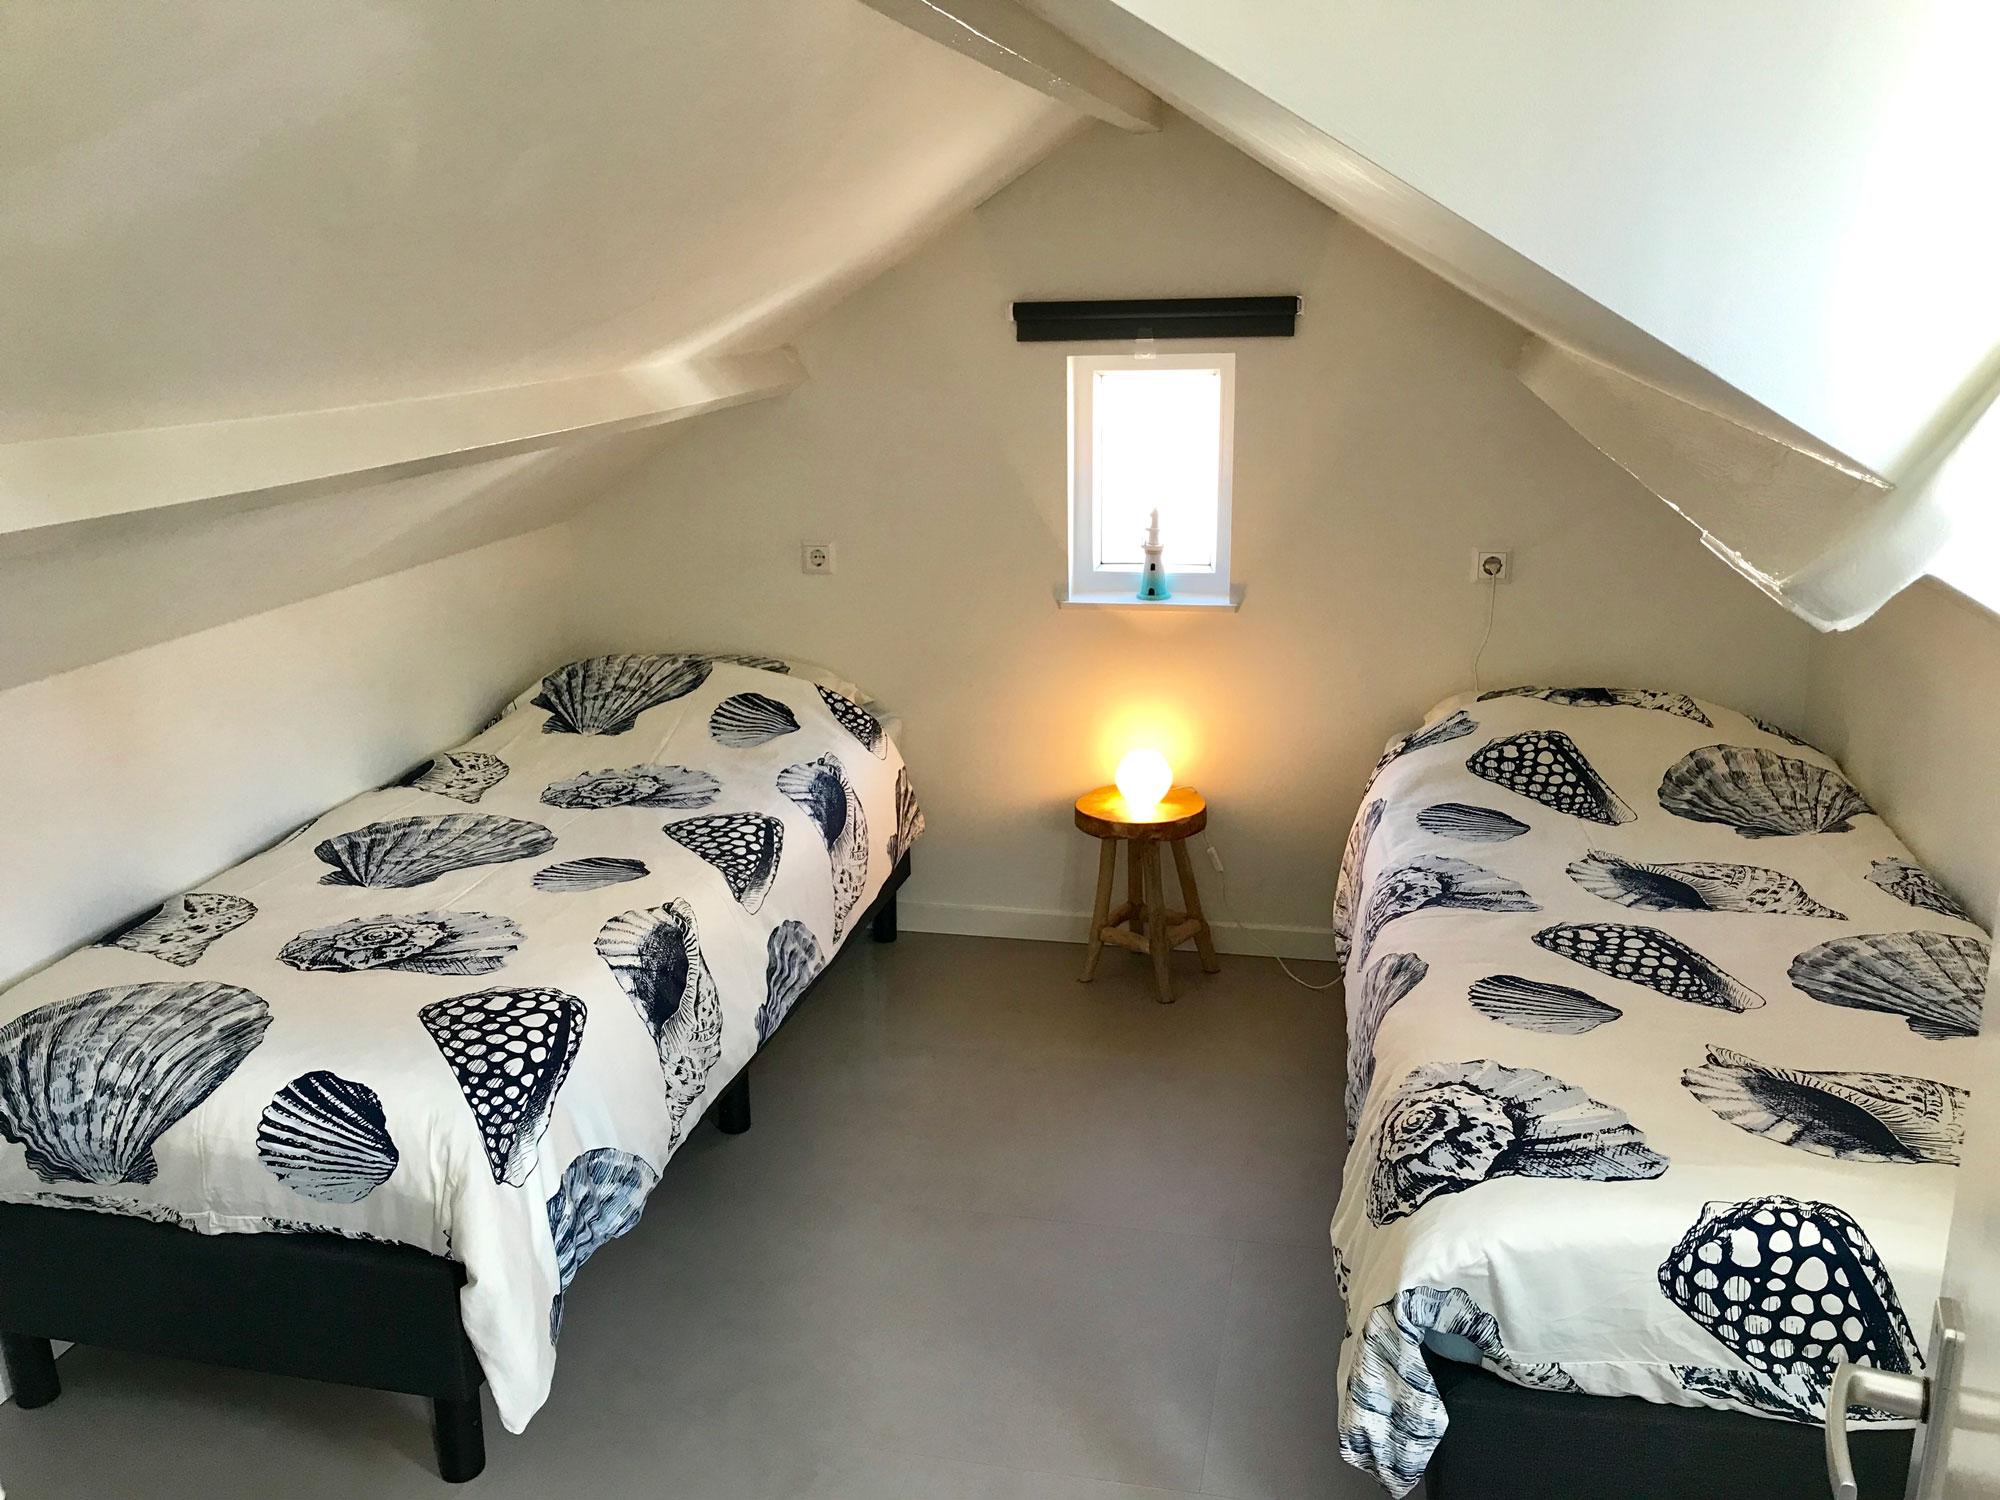 slaapkamer-3-6-persoonshuis-met-lamp-aan